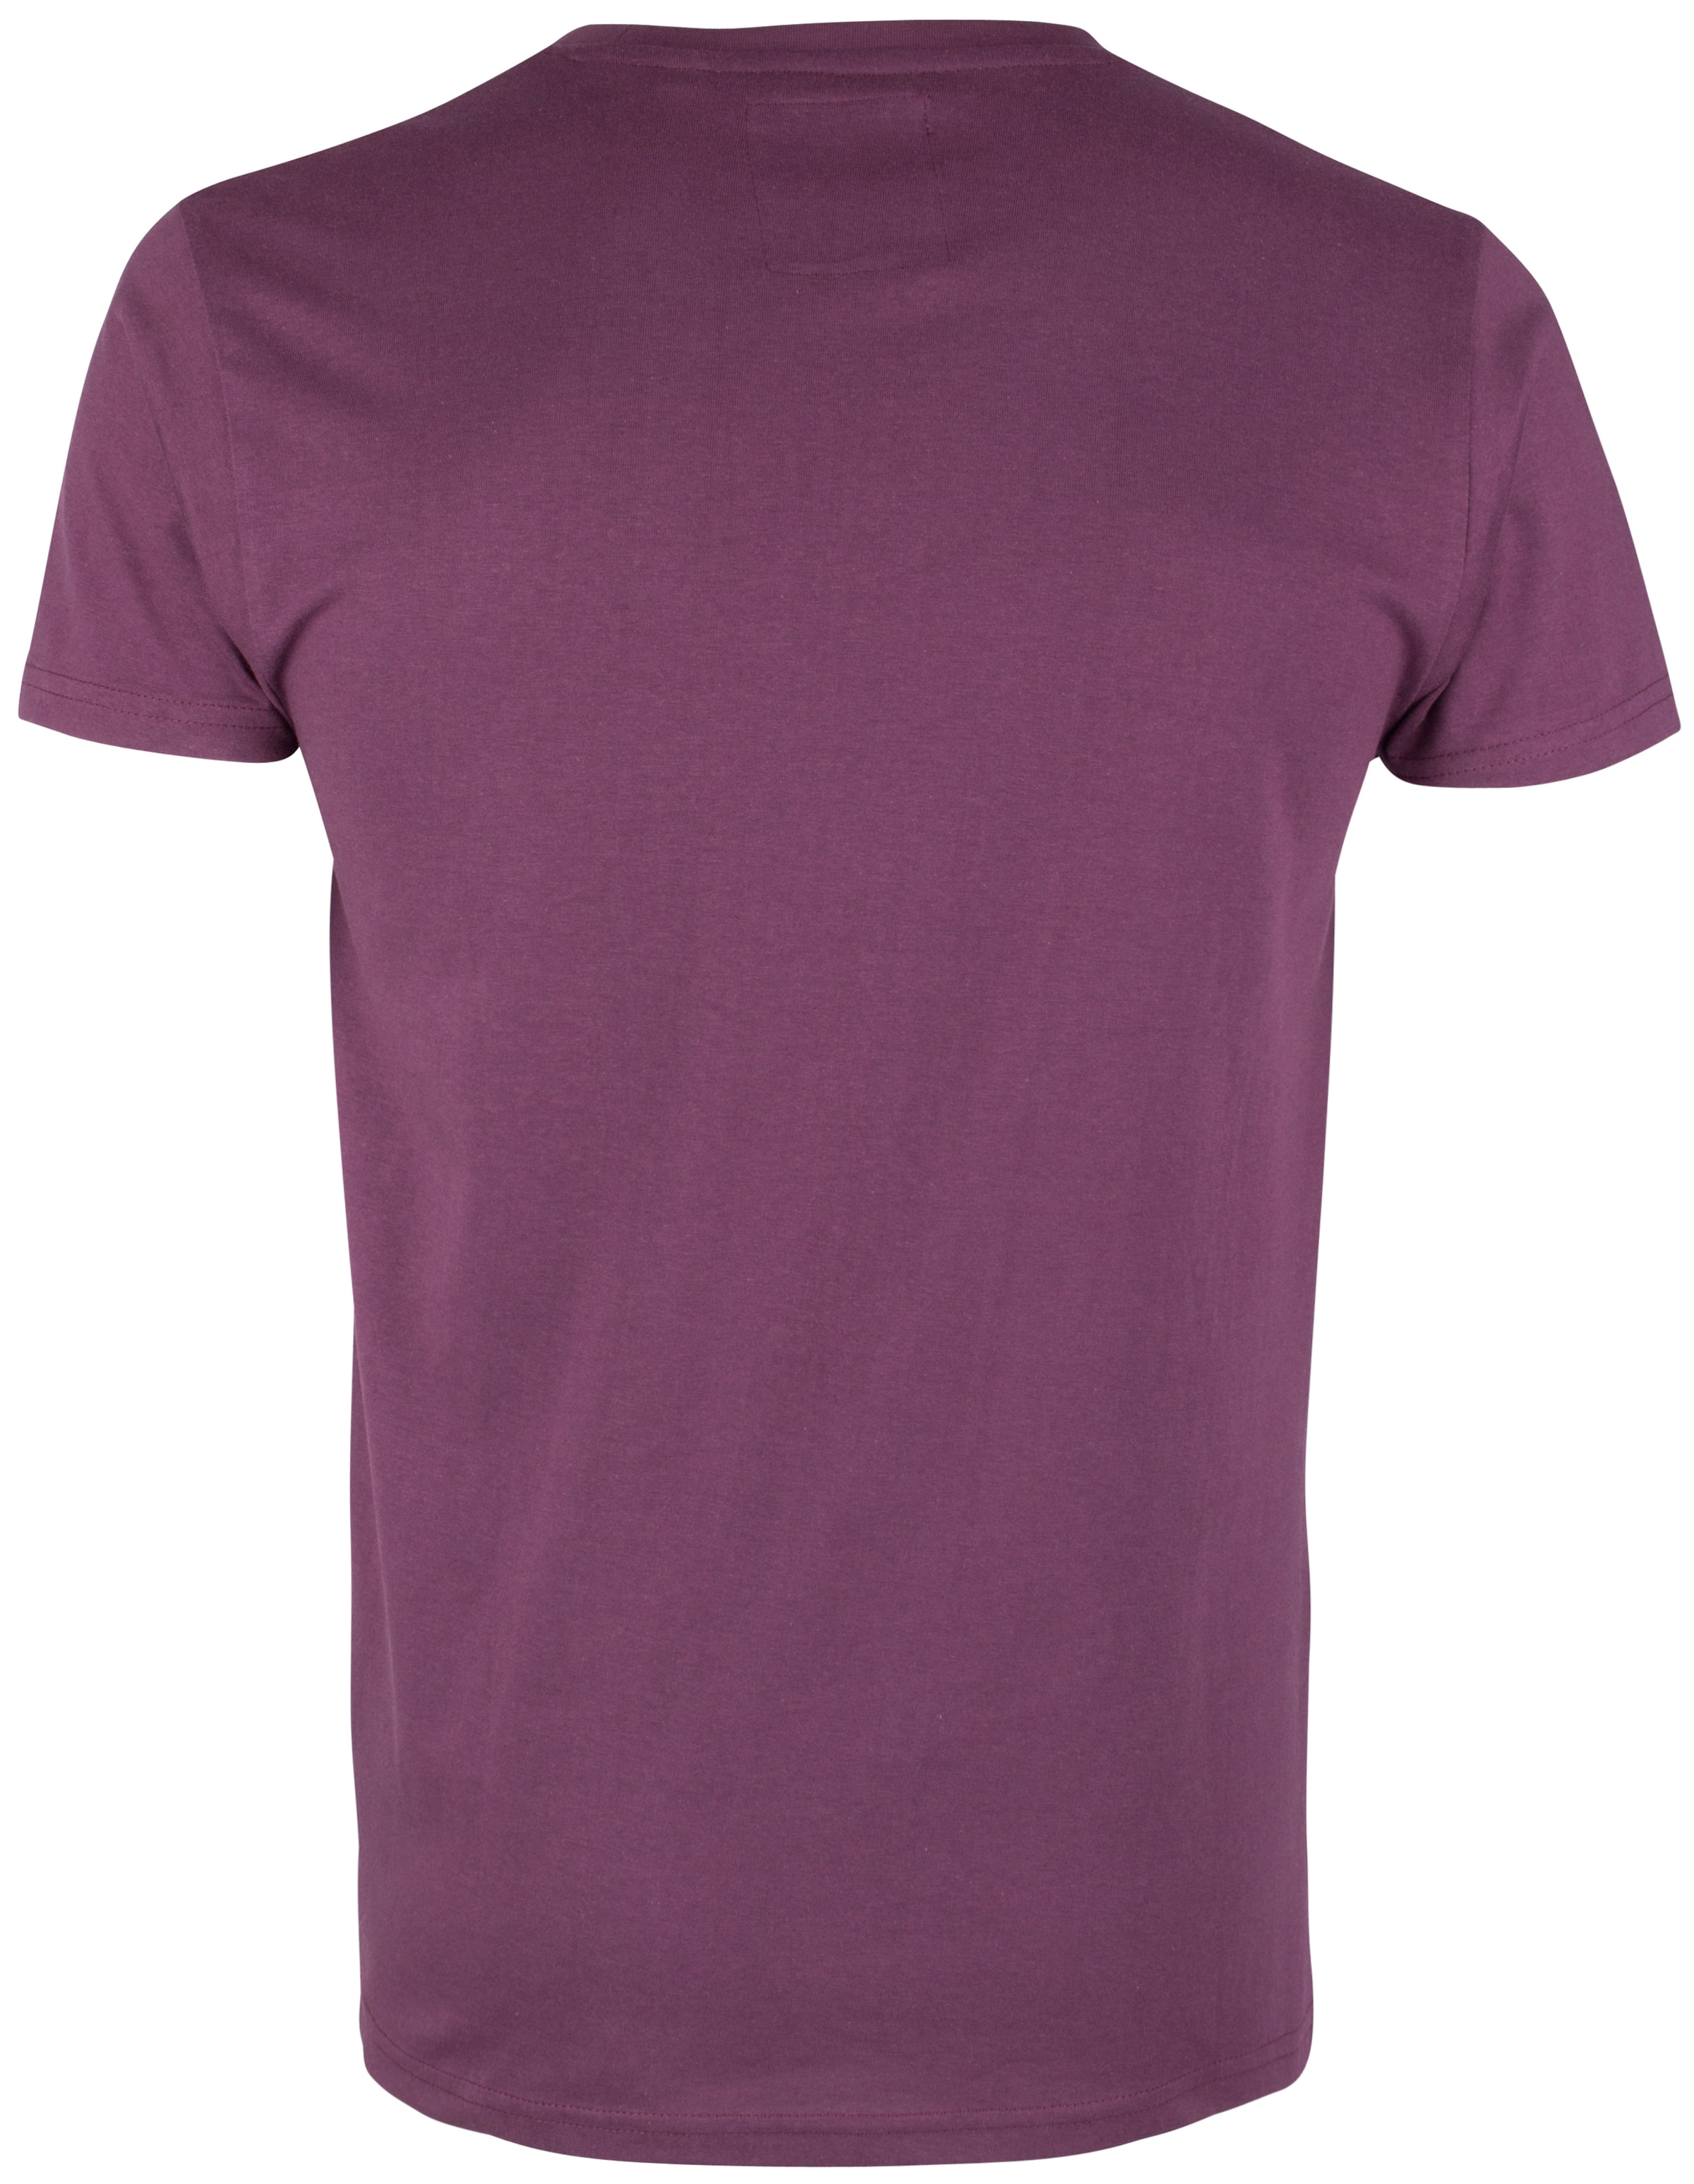 SOULSTAR T-Shirt Spielraum Offiziellen Zum Verkauf Großhandelspreis Rabatt Niedrig Kosten vgljK5ptO